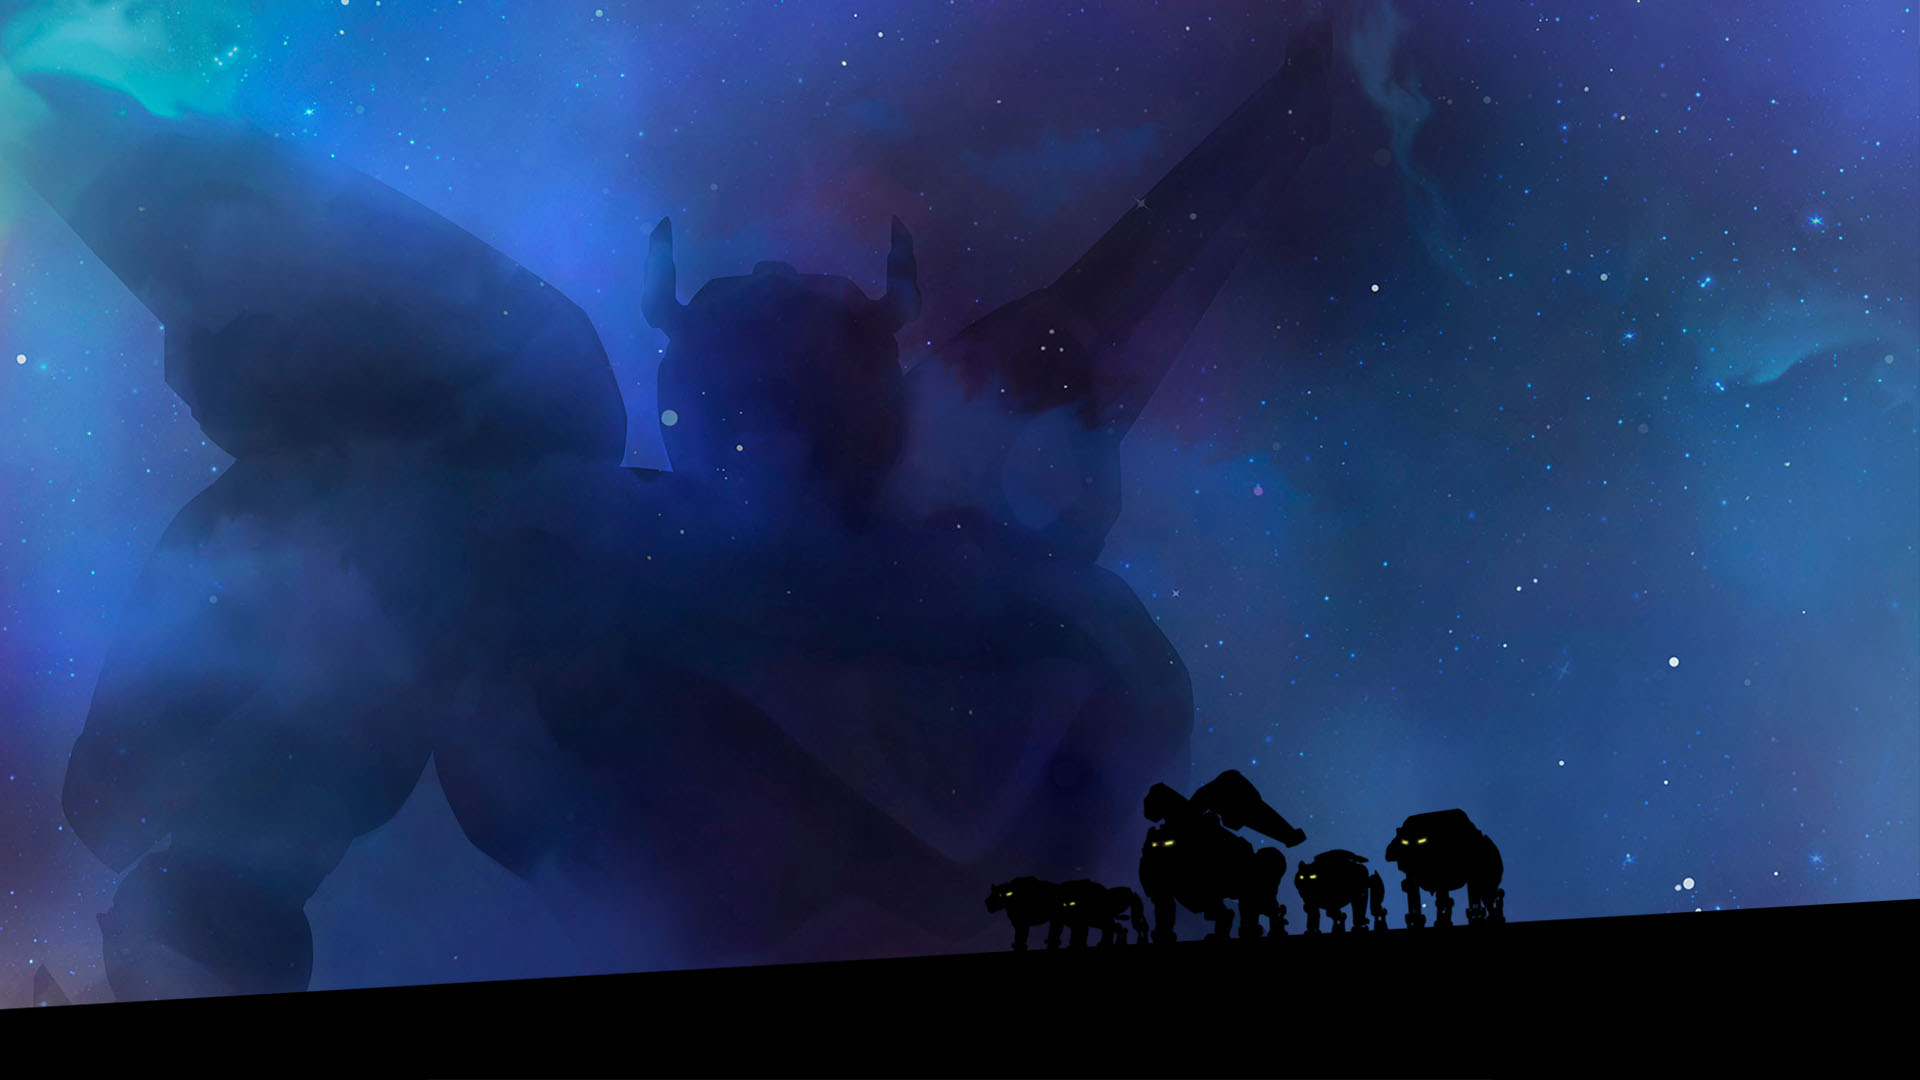 Defender Of The Universe Wallpaper Hd Voltron Legendary Defender